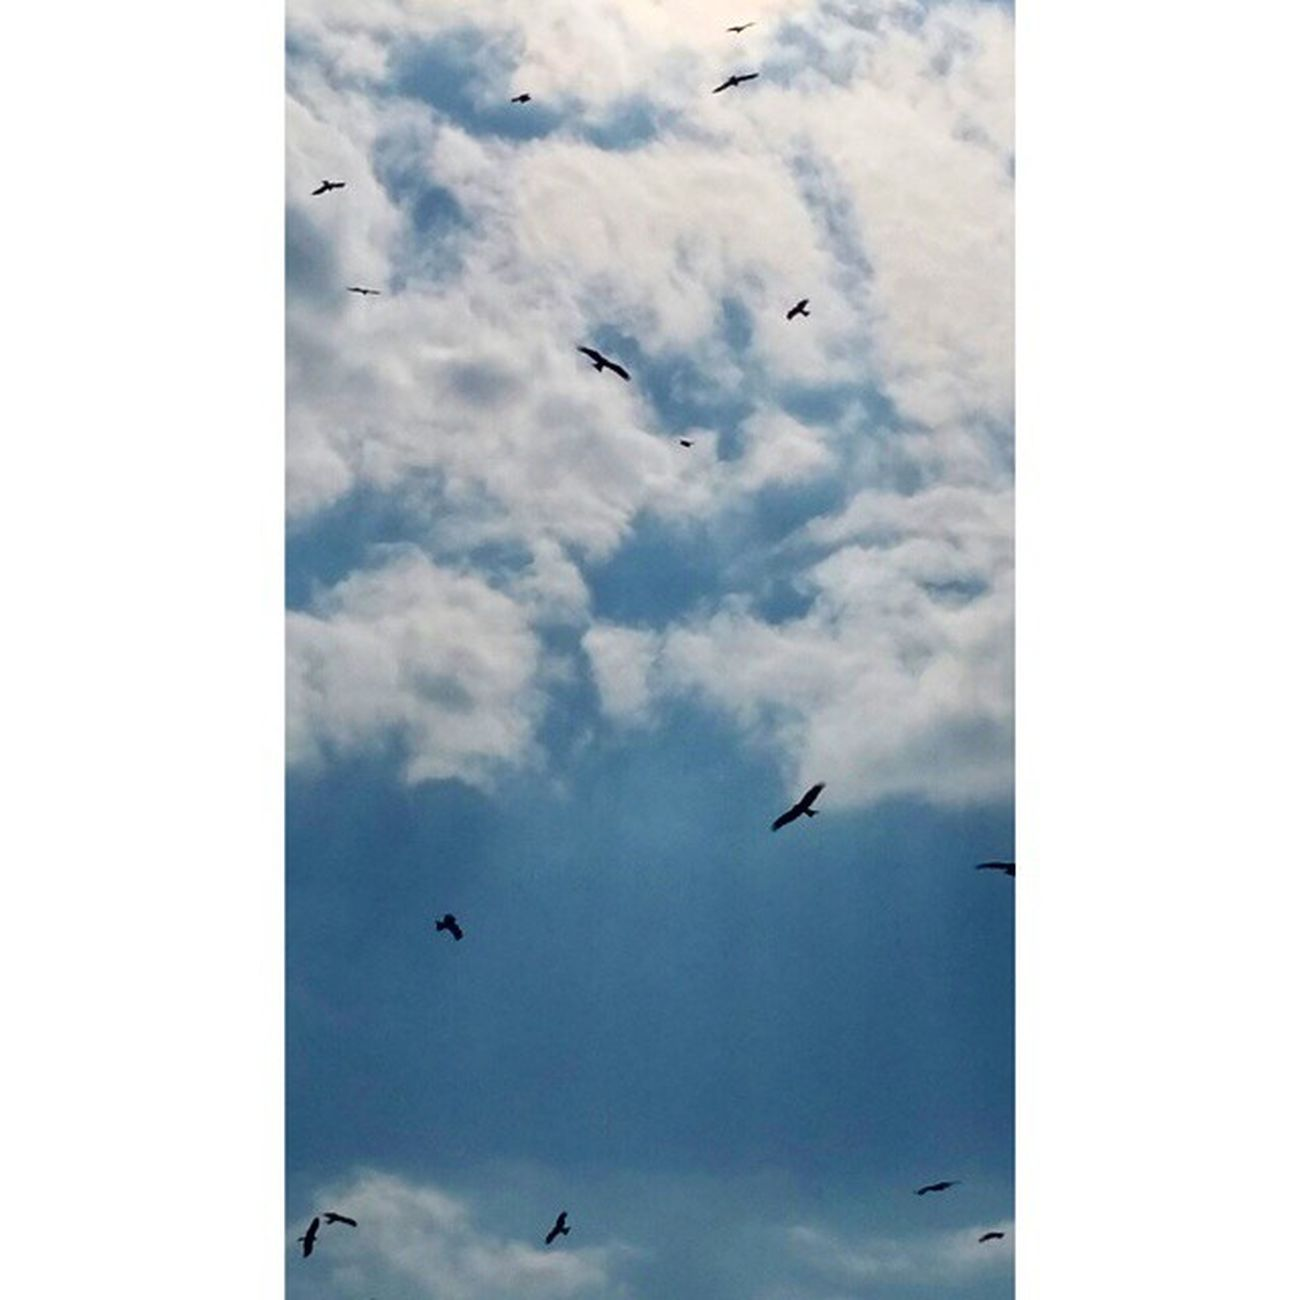 Beautiful clouds with a dash of birds! Karachi Pakistan Nature Mothernature Cloudy Clouds Blueskies Birds Eagles Scavengers Blue Sky Skyline Skylovers Skyback Beautiful Gorgeous Aimanadeel